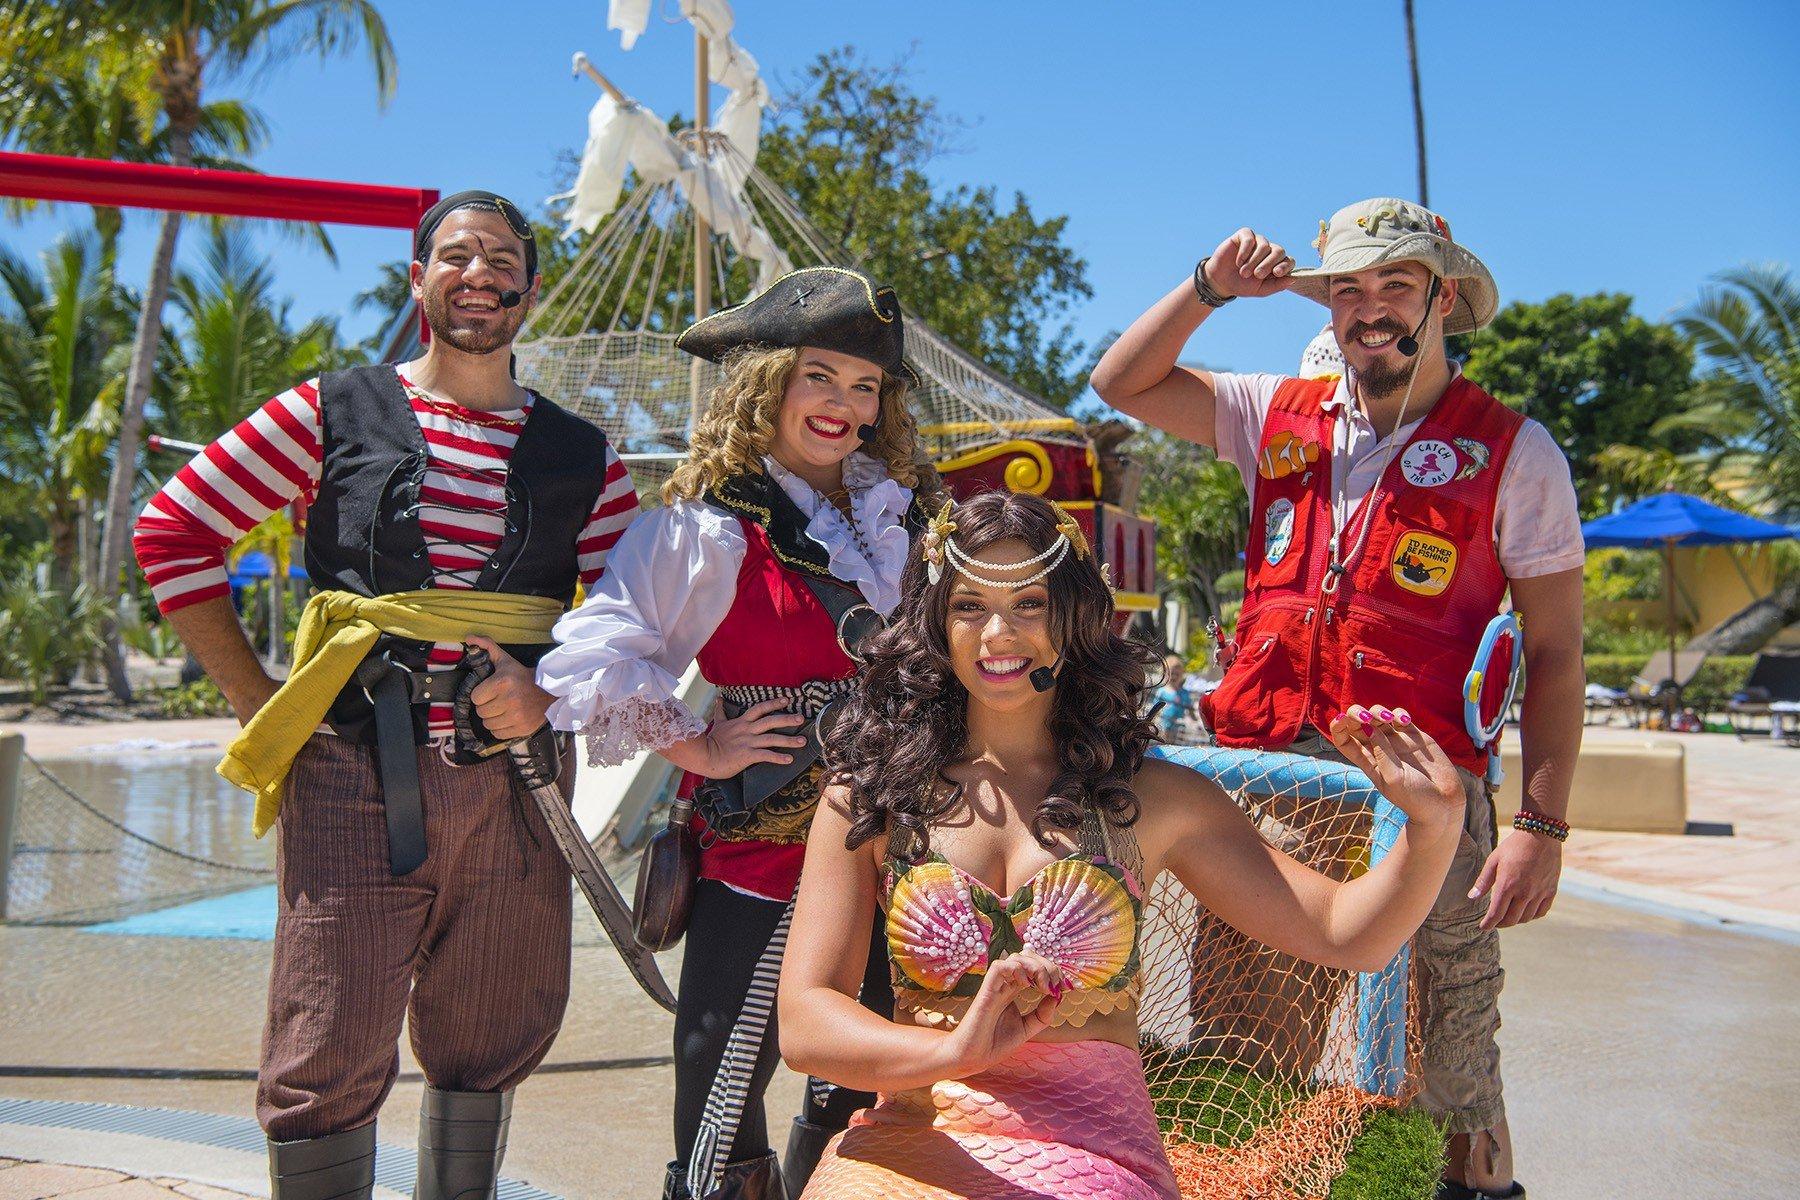 Swashbuckling Pirate Show at Hawks Cay Resort